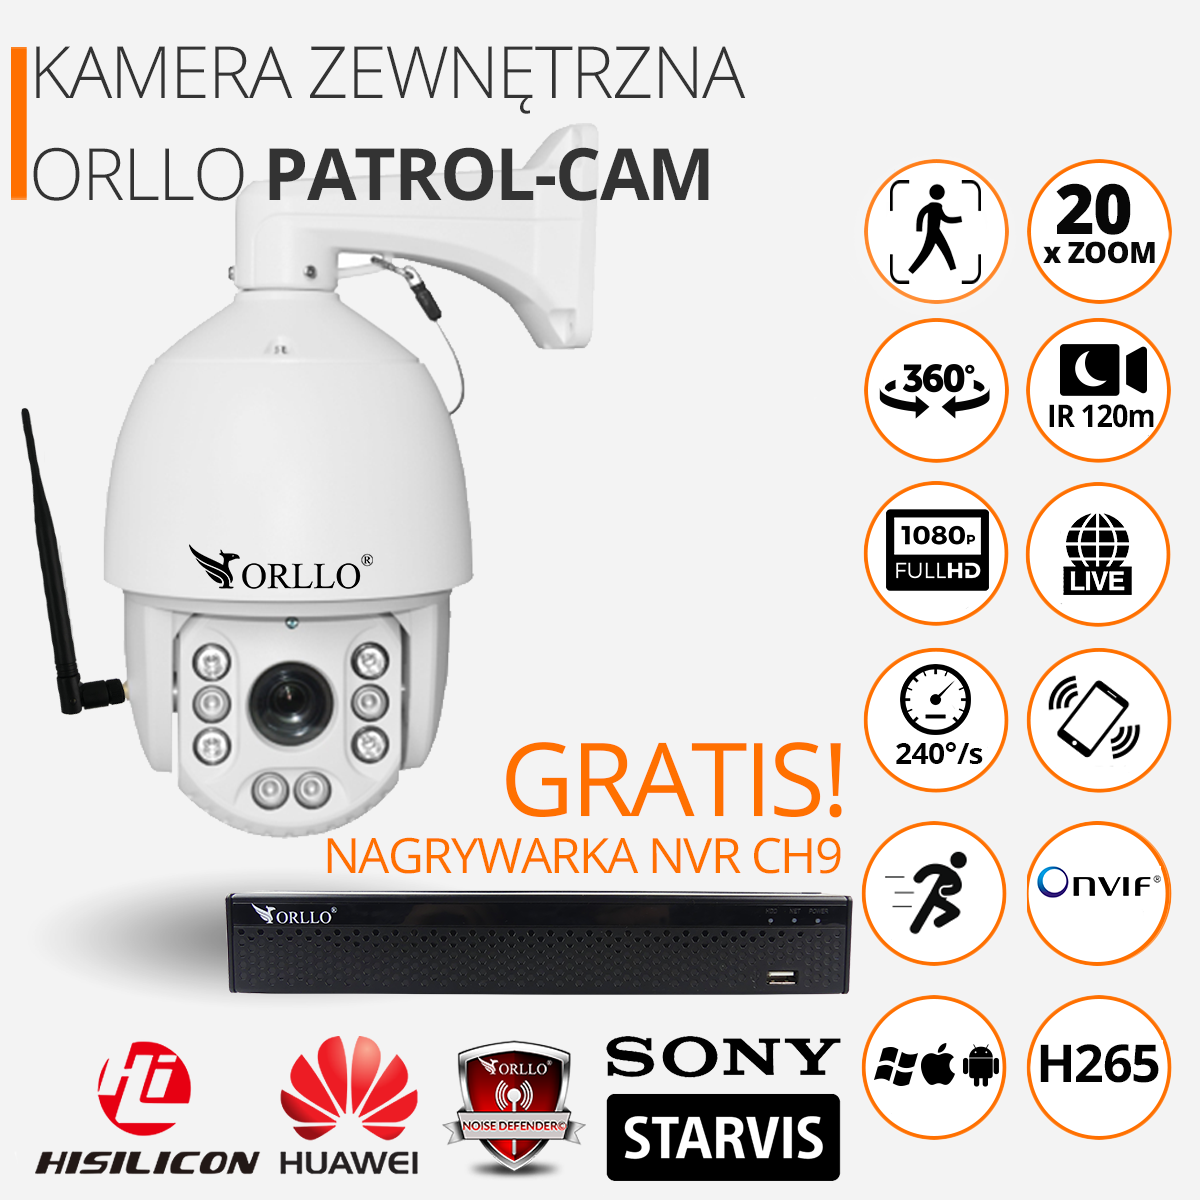 kamera podązajaca za ruchem obrotowa z zoom orllo.pl